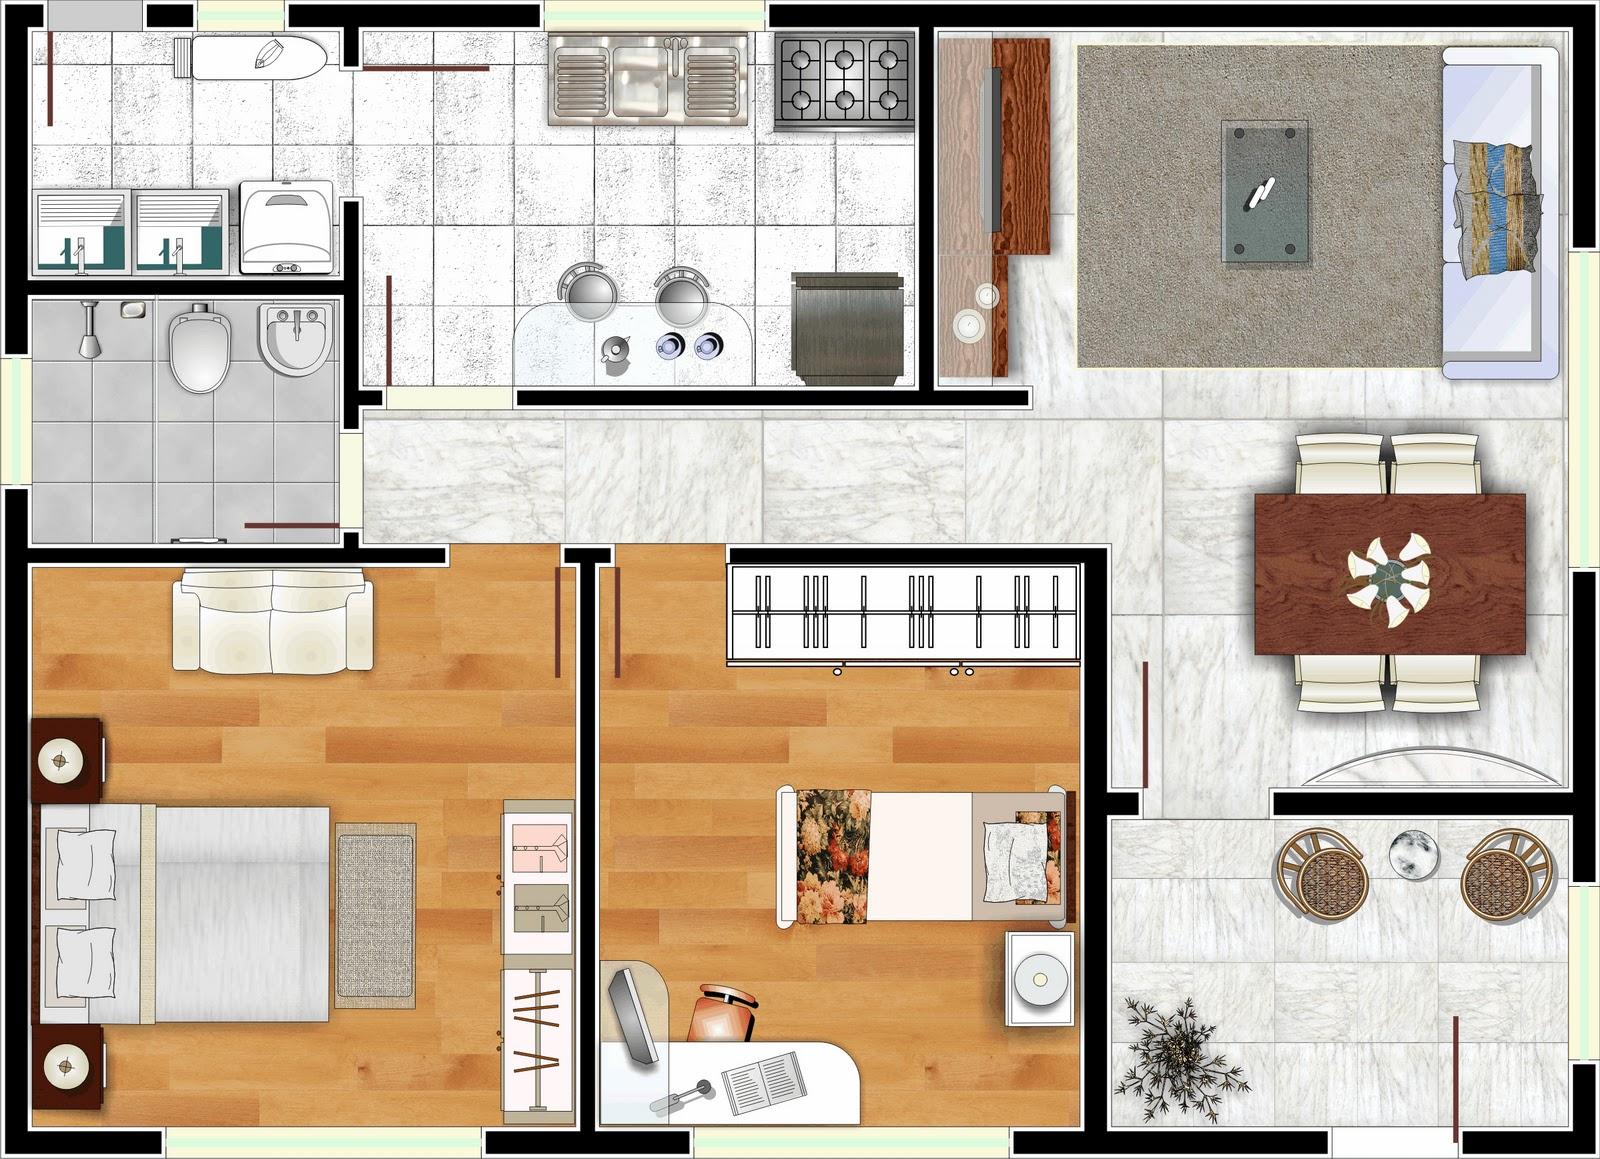 Planta baixa de casas pequenas modernas modelos incr veis - Plantas bonitas de interior ...